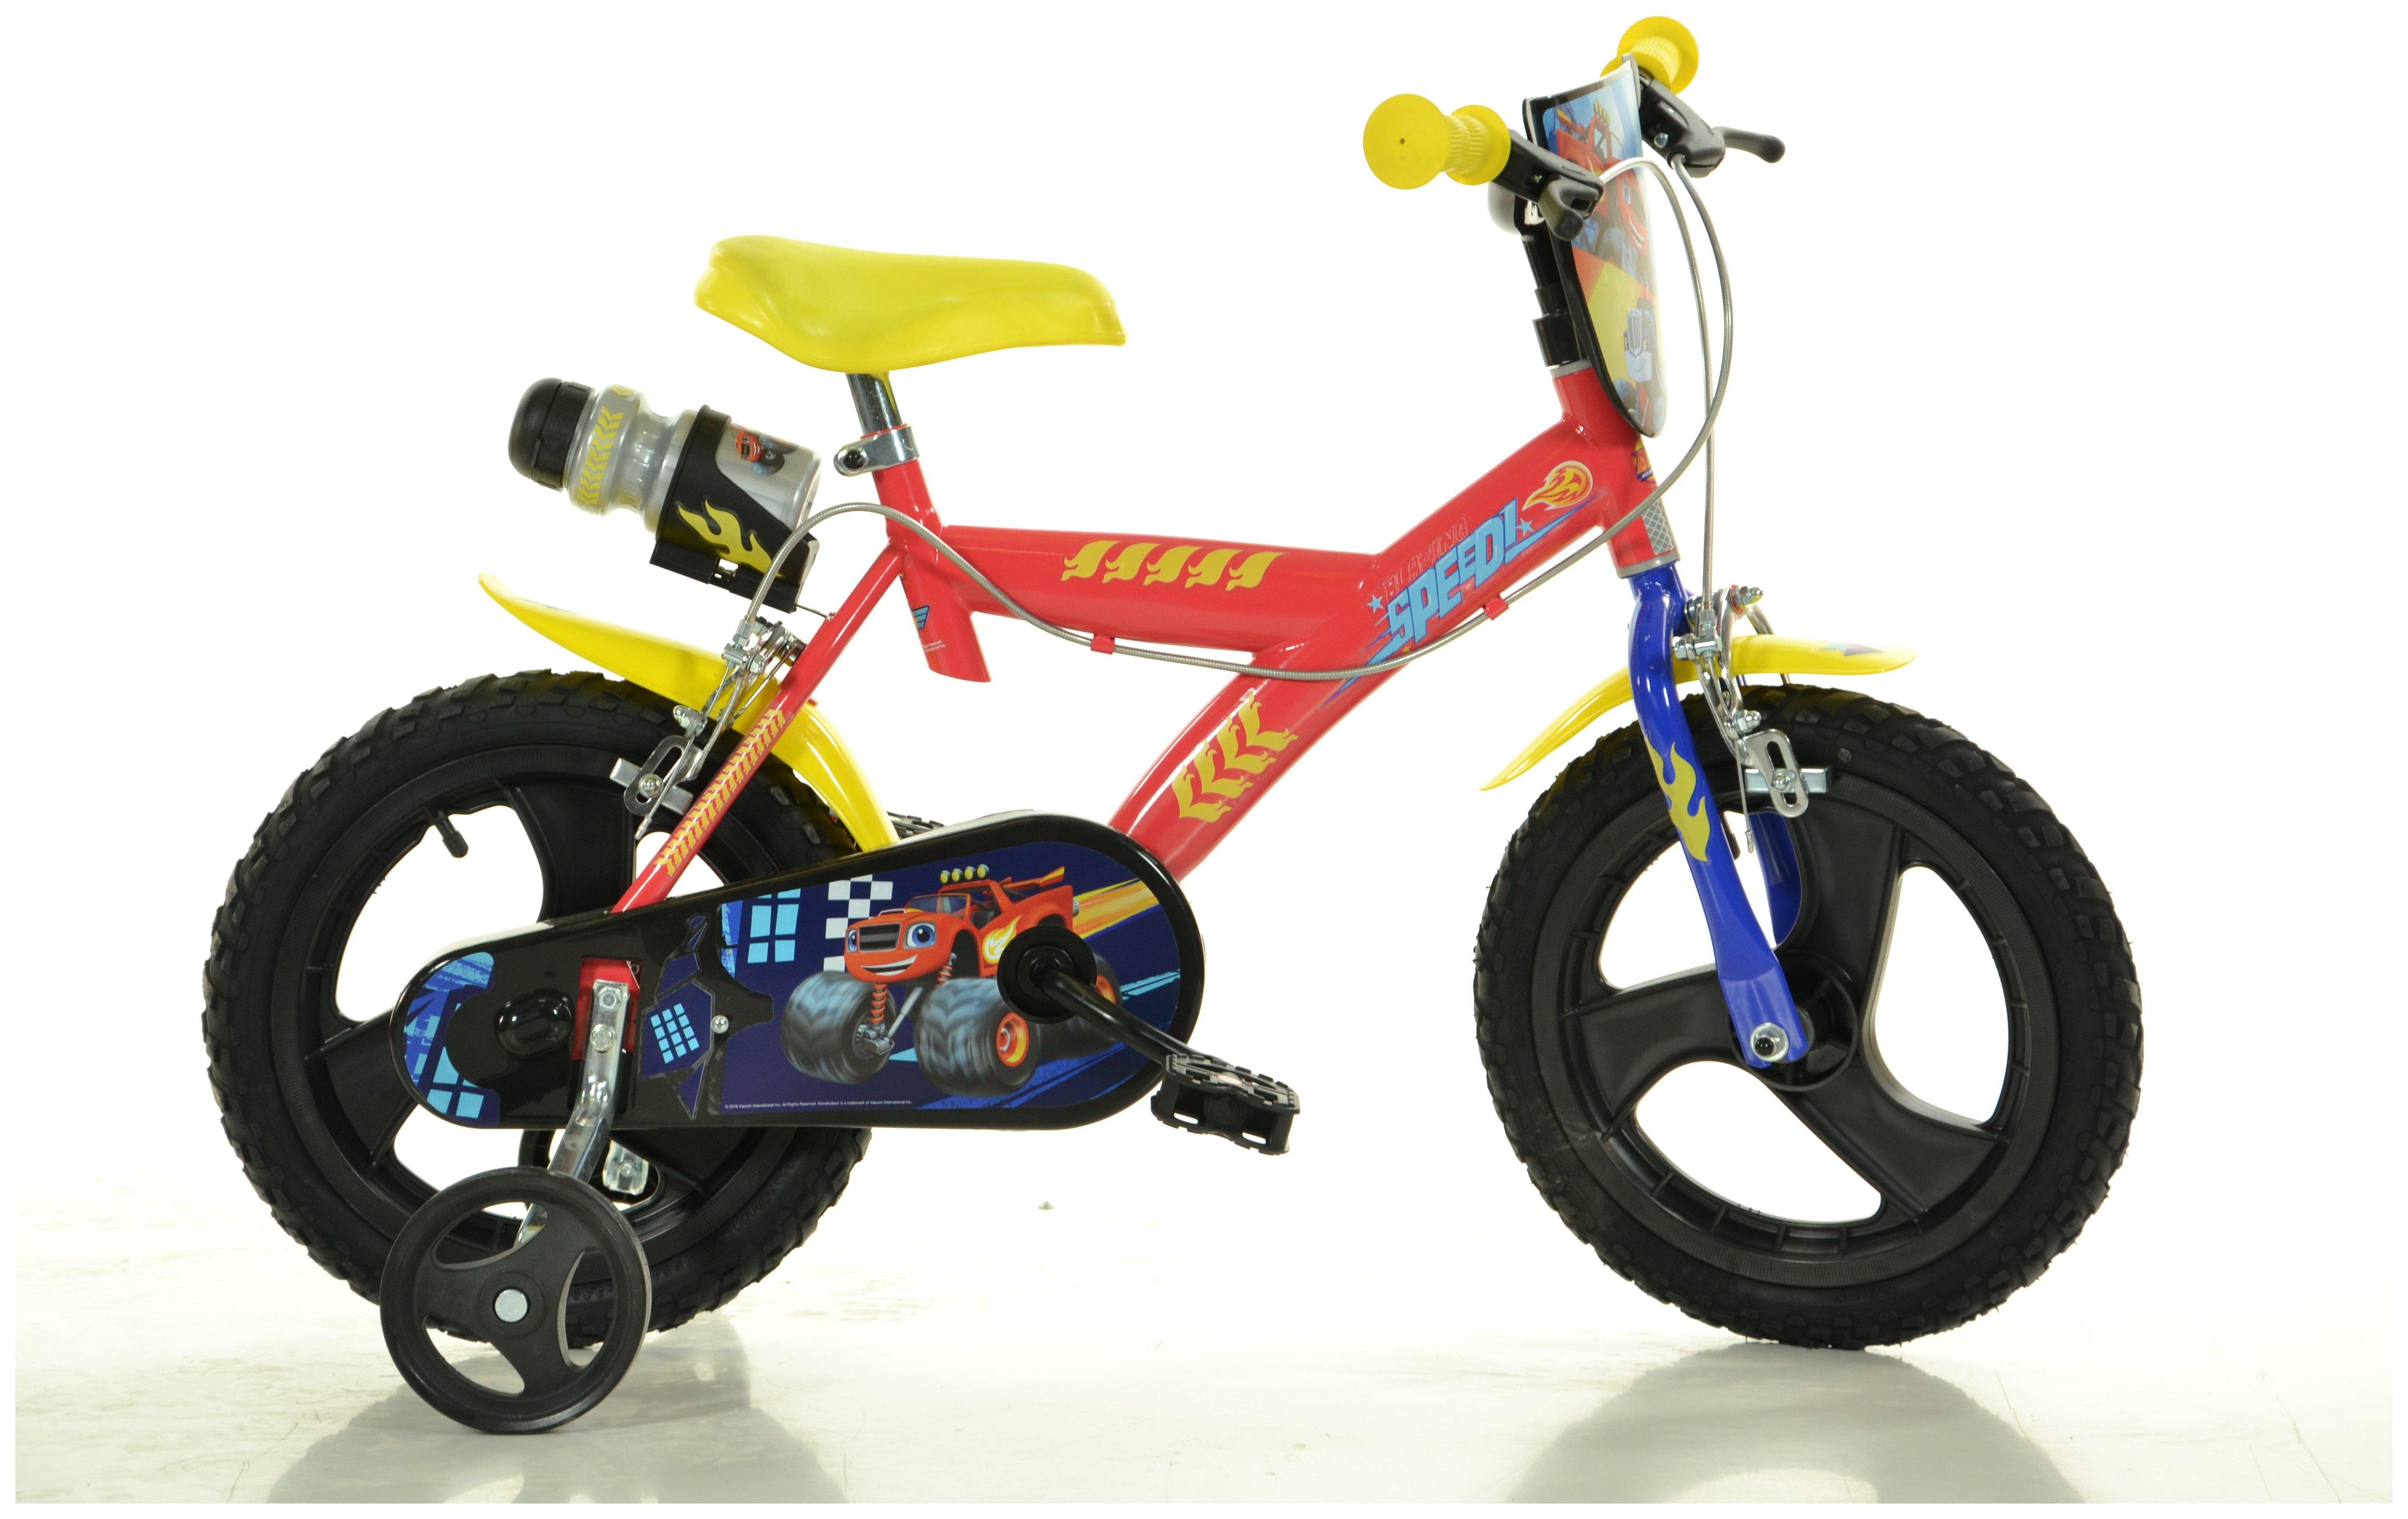 Image of Blaze 14 Inch Bike.